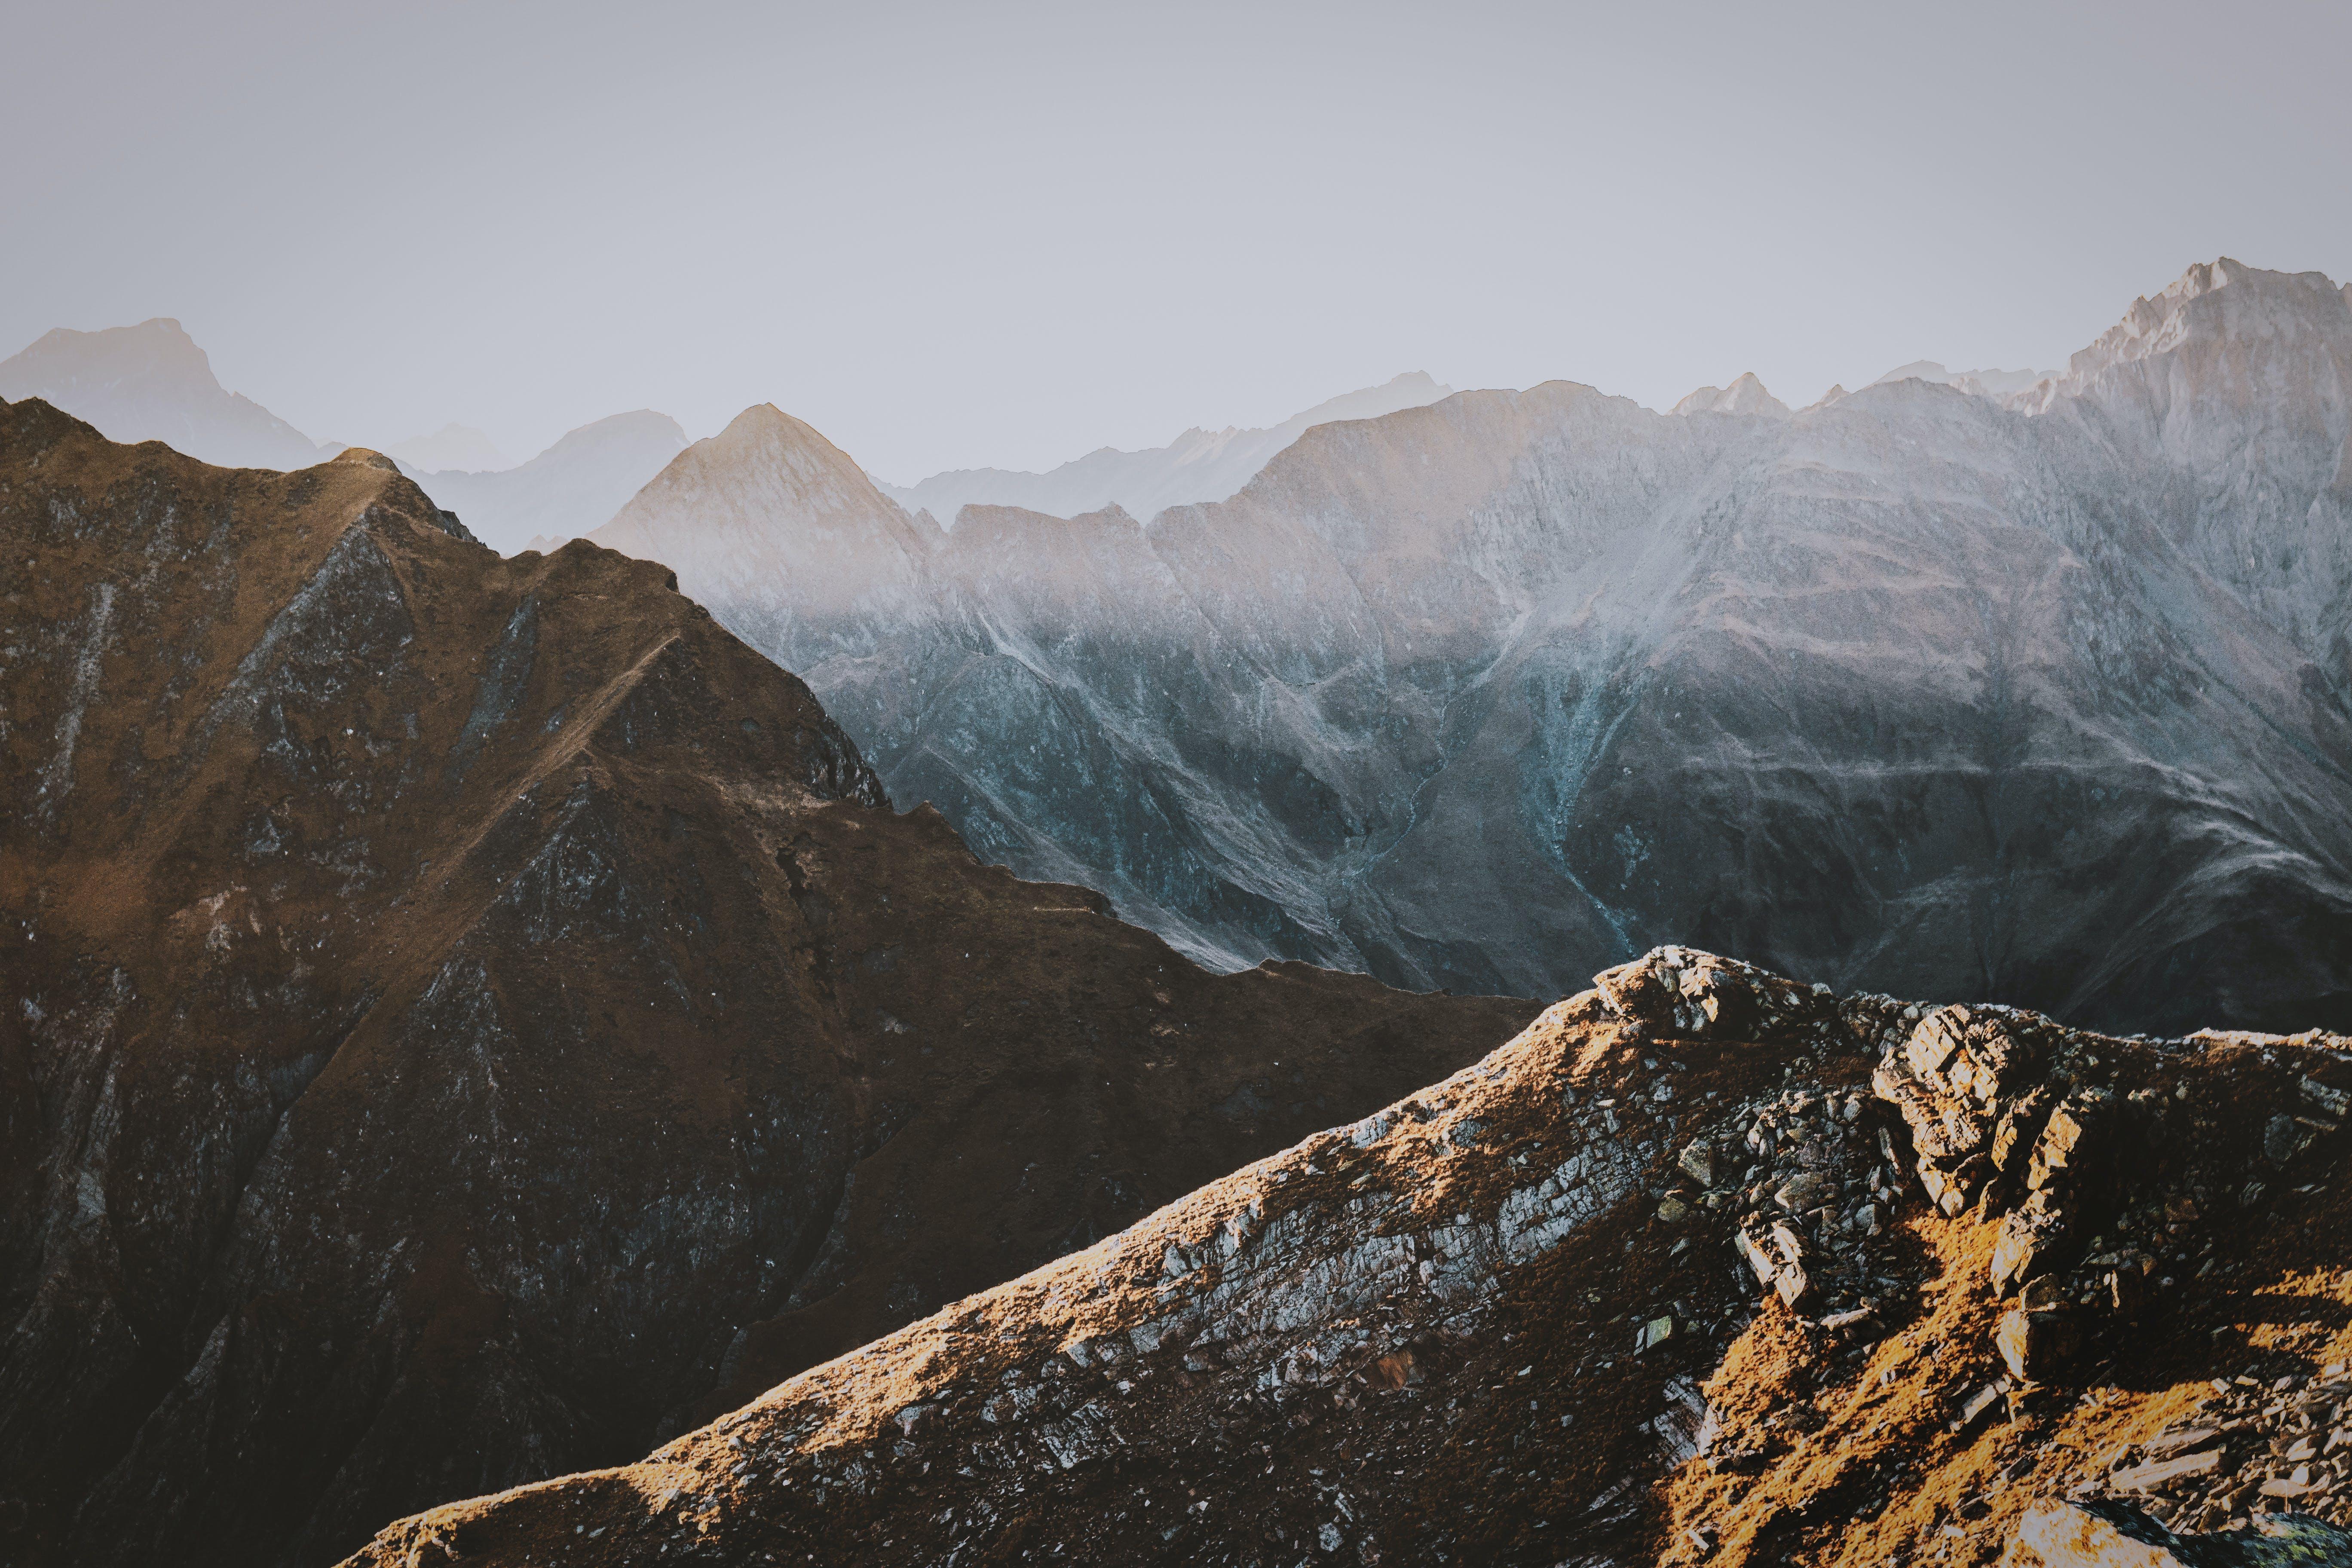 Kostenloses Stock Foto zu alpen, berge, hd wallpaper, landschaft